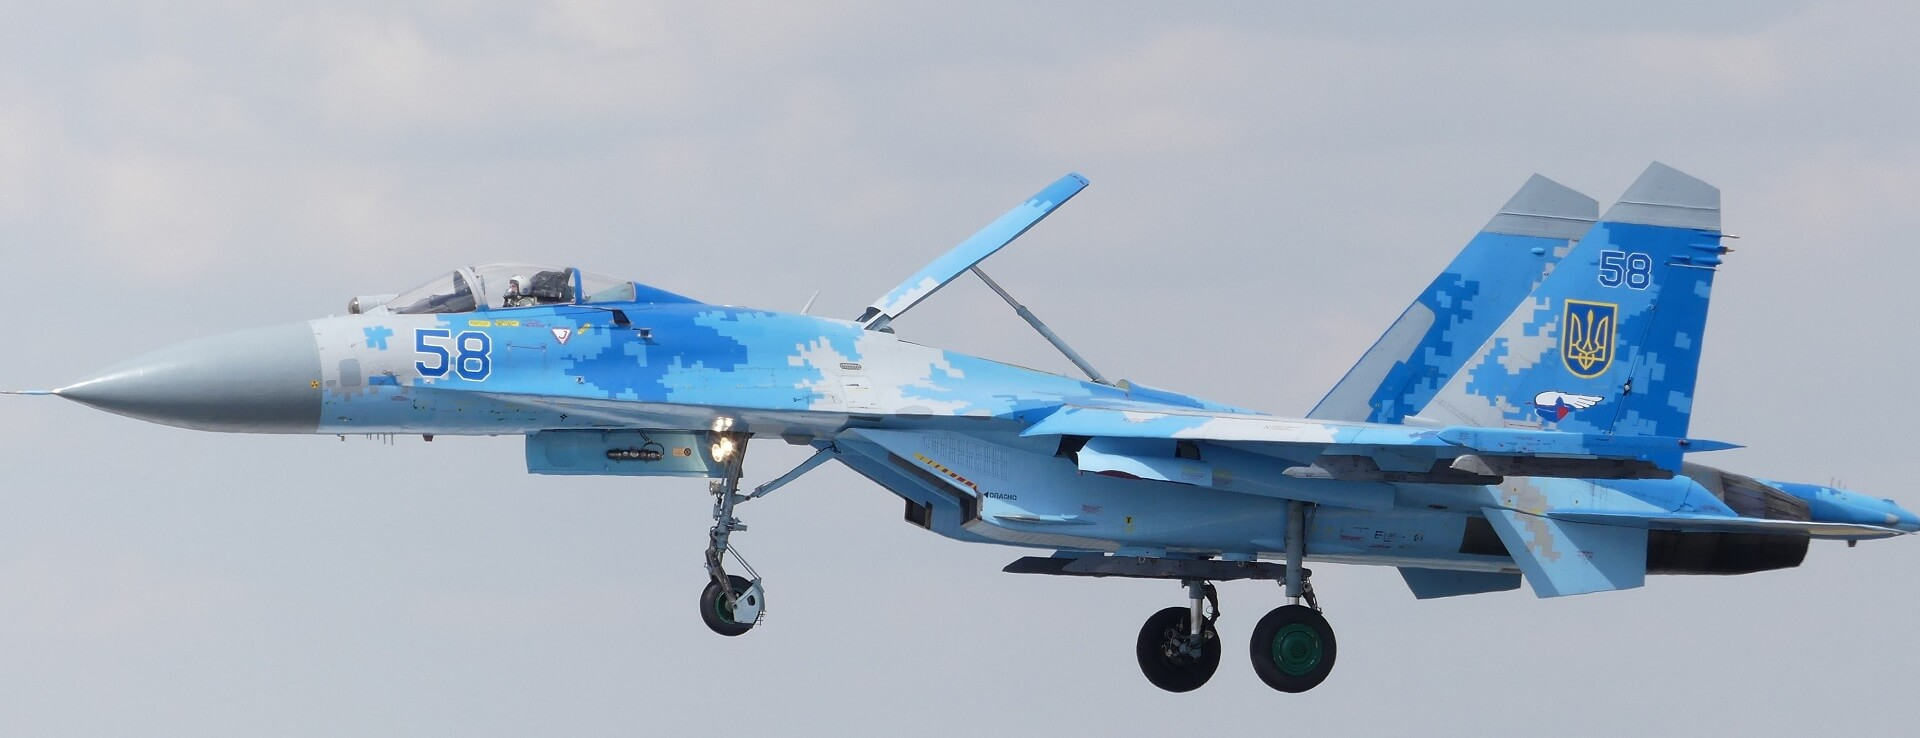 Image of an Su-27